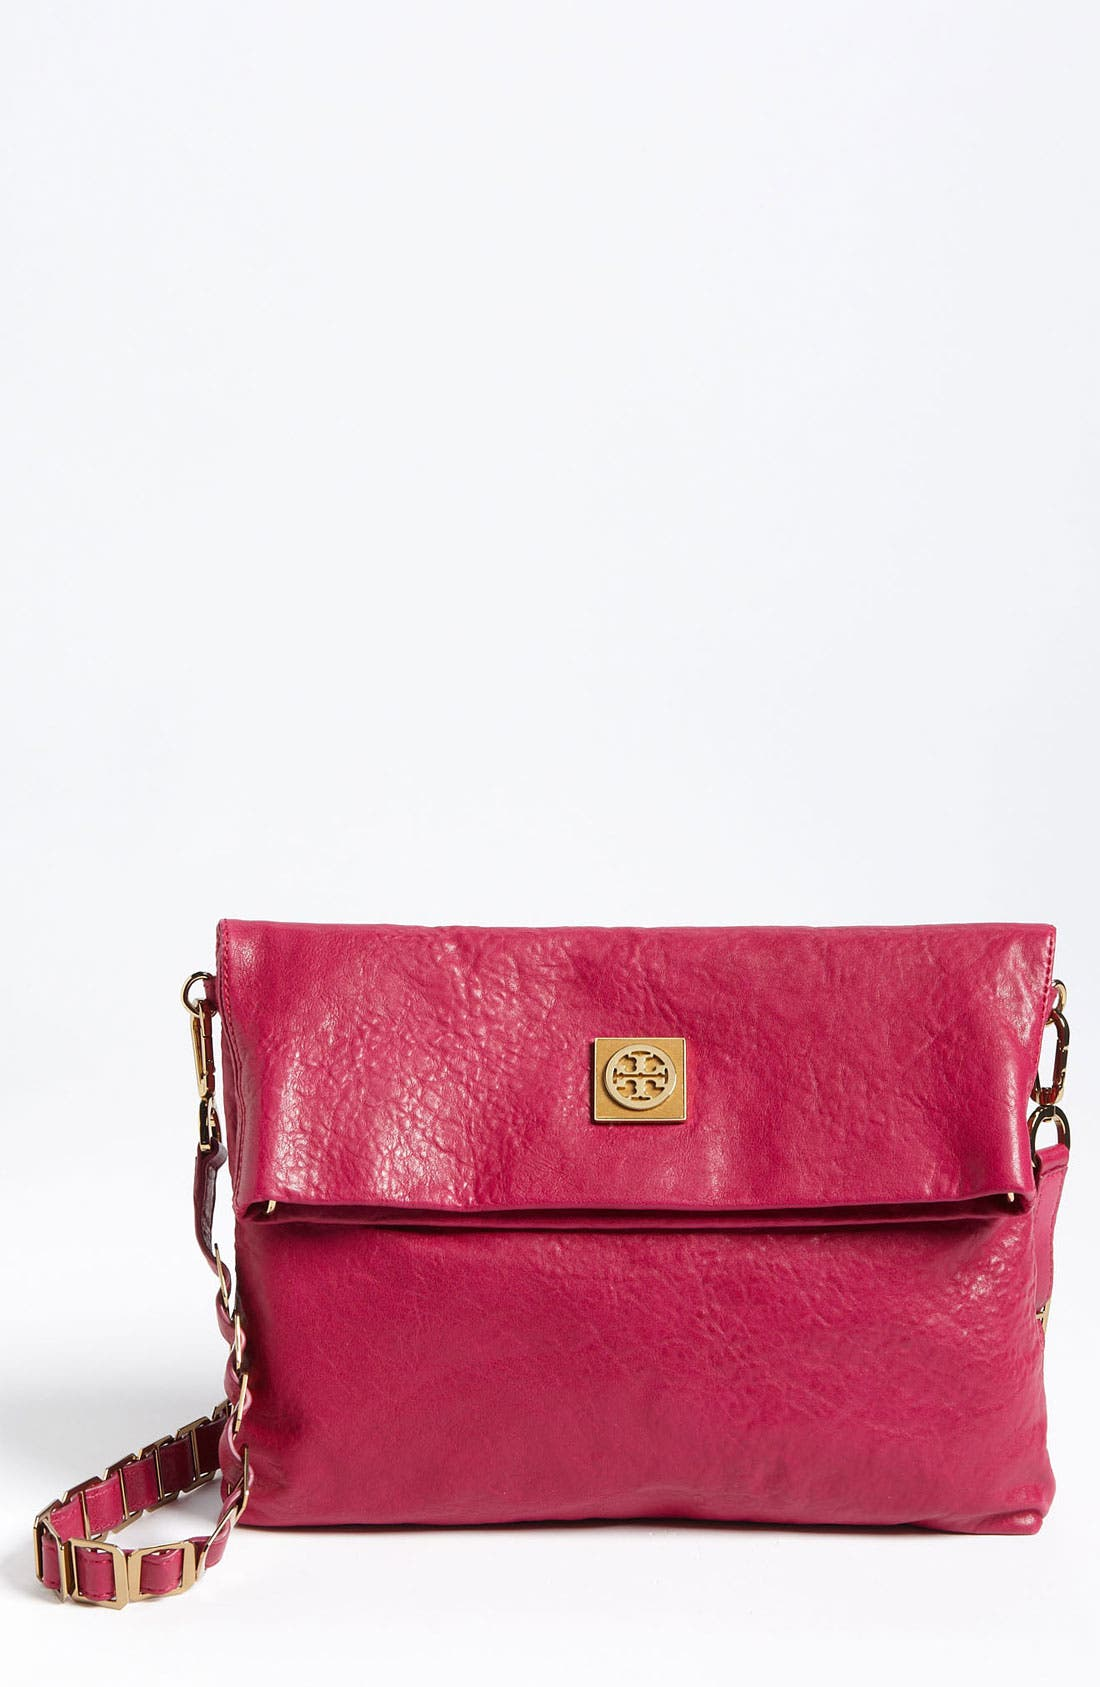 Alternate Image 1 Selected - Tory Burch 'Louiisa' Crossbody Bag